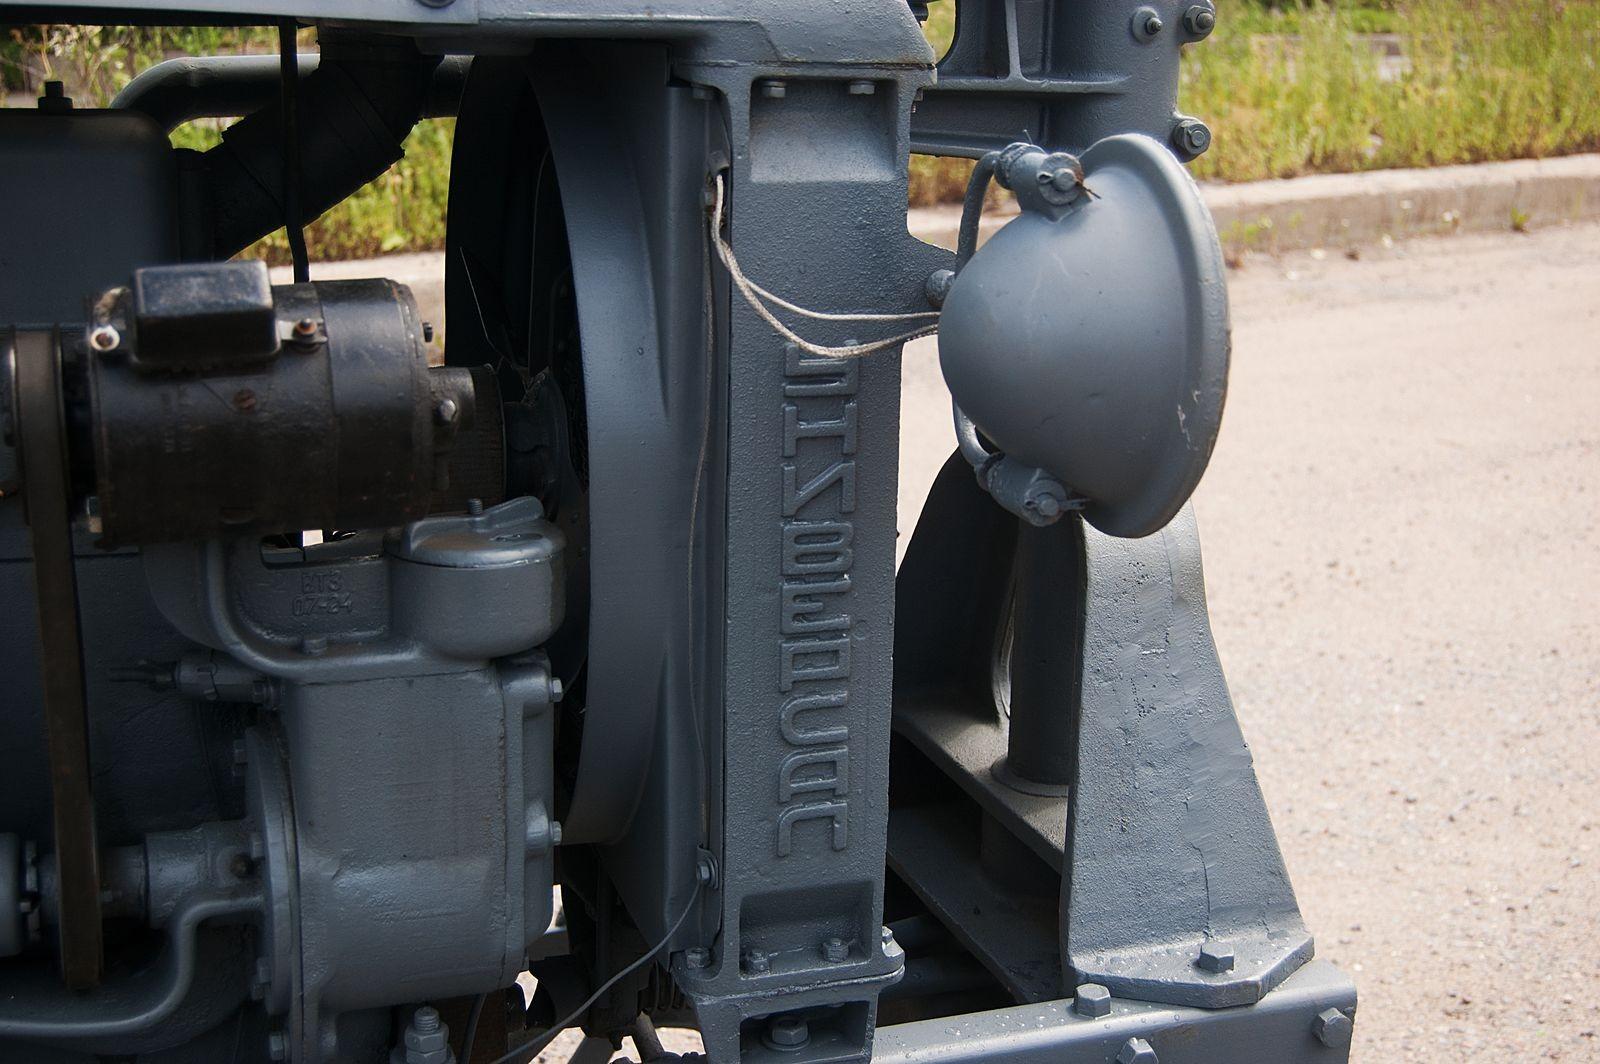 Колесница коллективизации: тест-драйв трактора Универсал-2 40-х годов